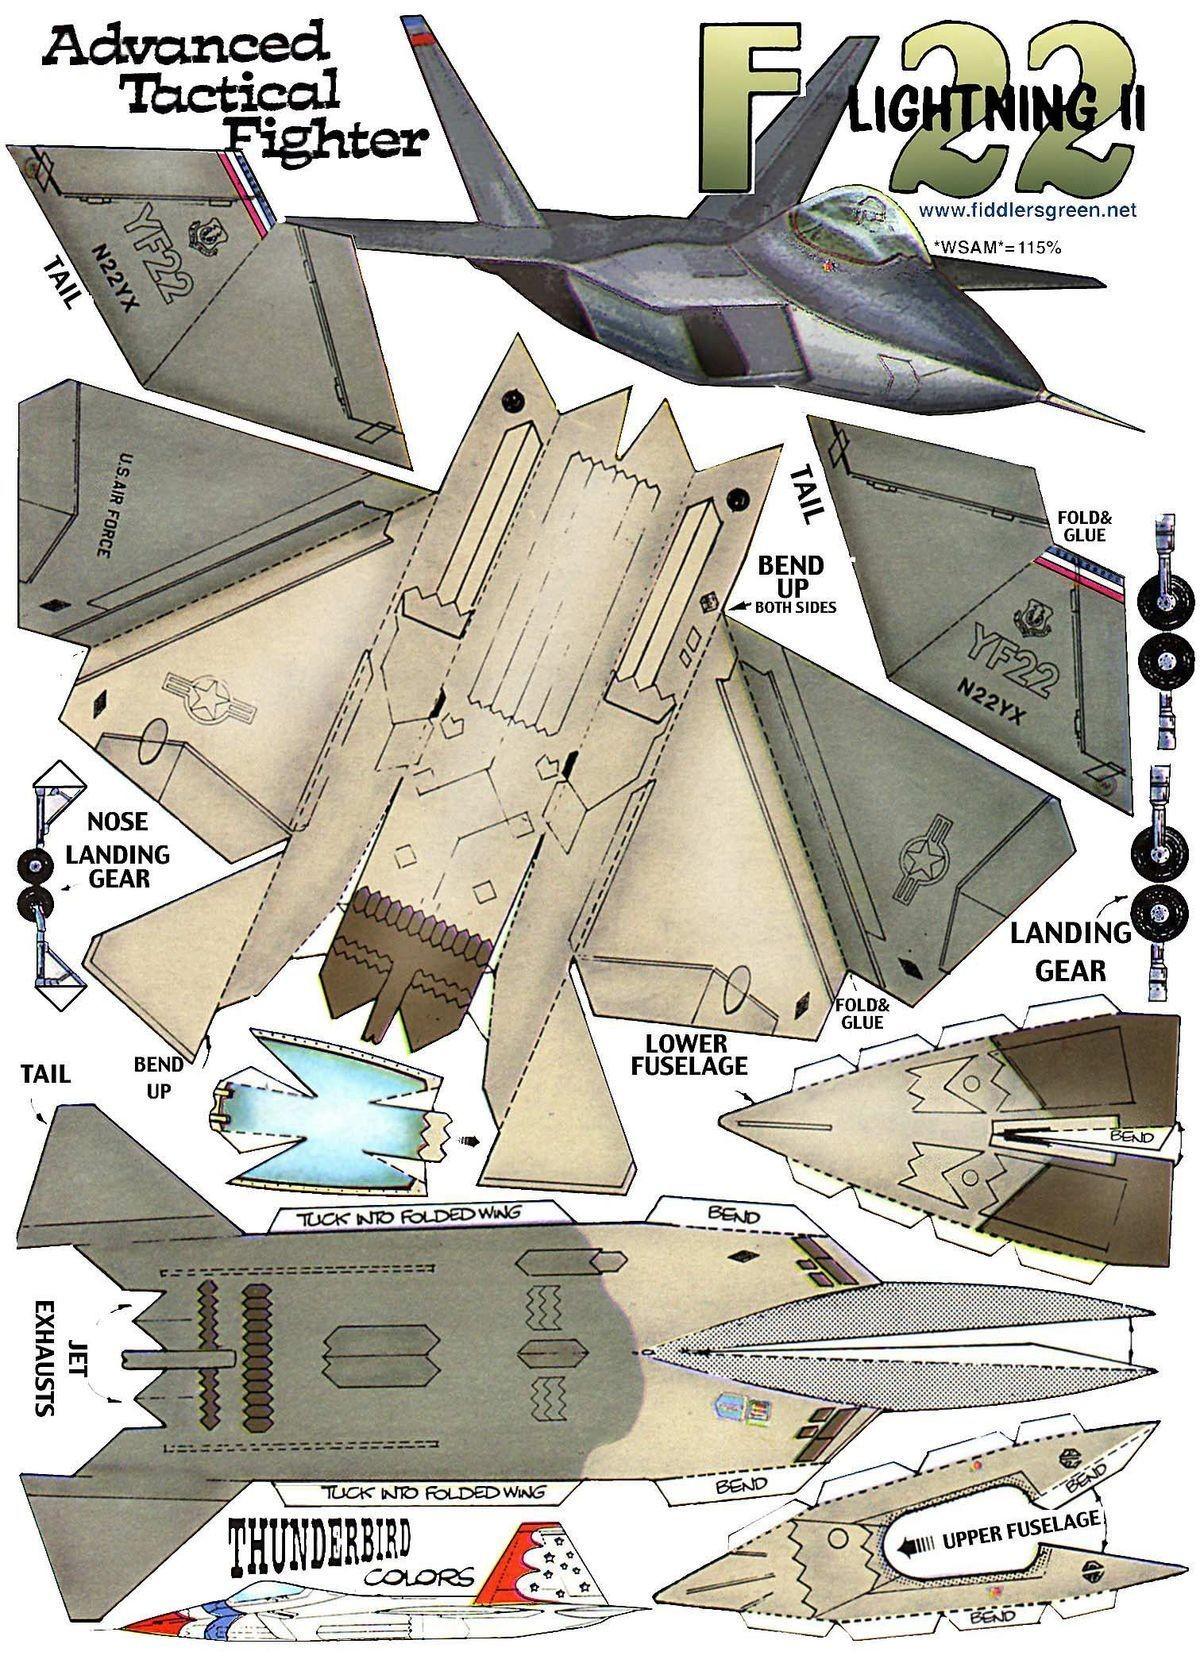 Space Shuttle Papercraft 6f182ac D378aaebcb9a A0 1 200—1 667 Pixels